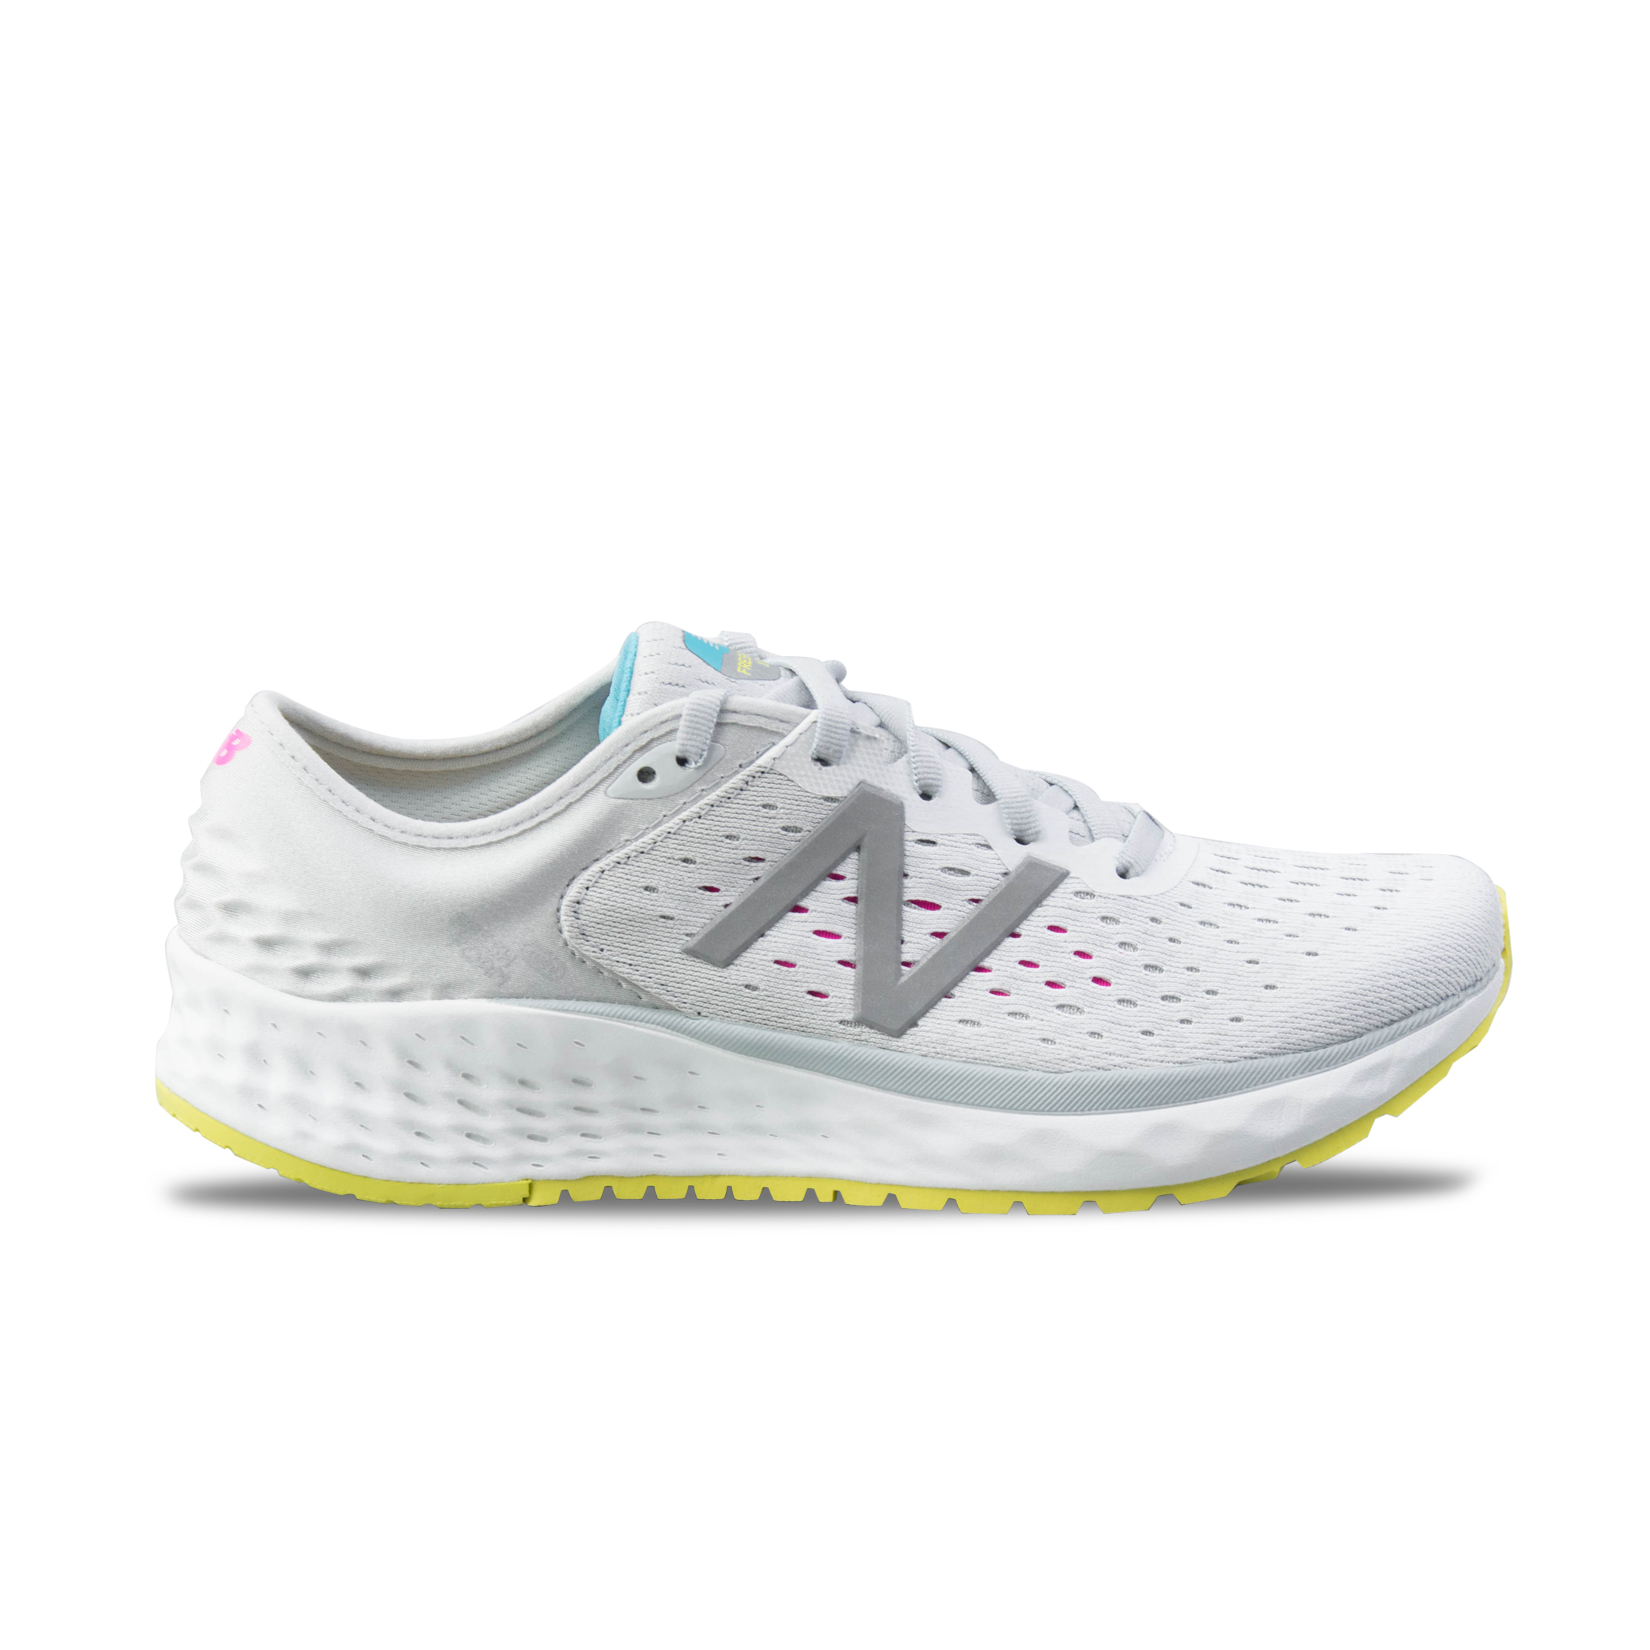 6abb2b747ca Γυναικεία Παπούτσια New Balance Fresh Foam 1080 v9 Λευκό   All-Sports.gr